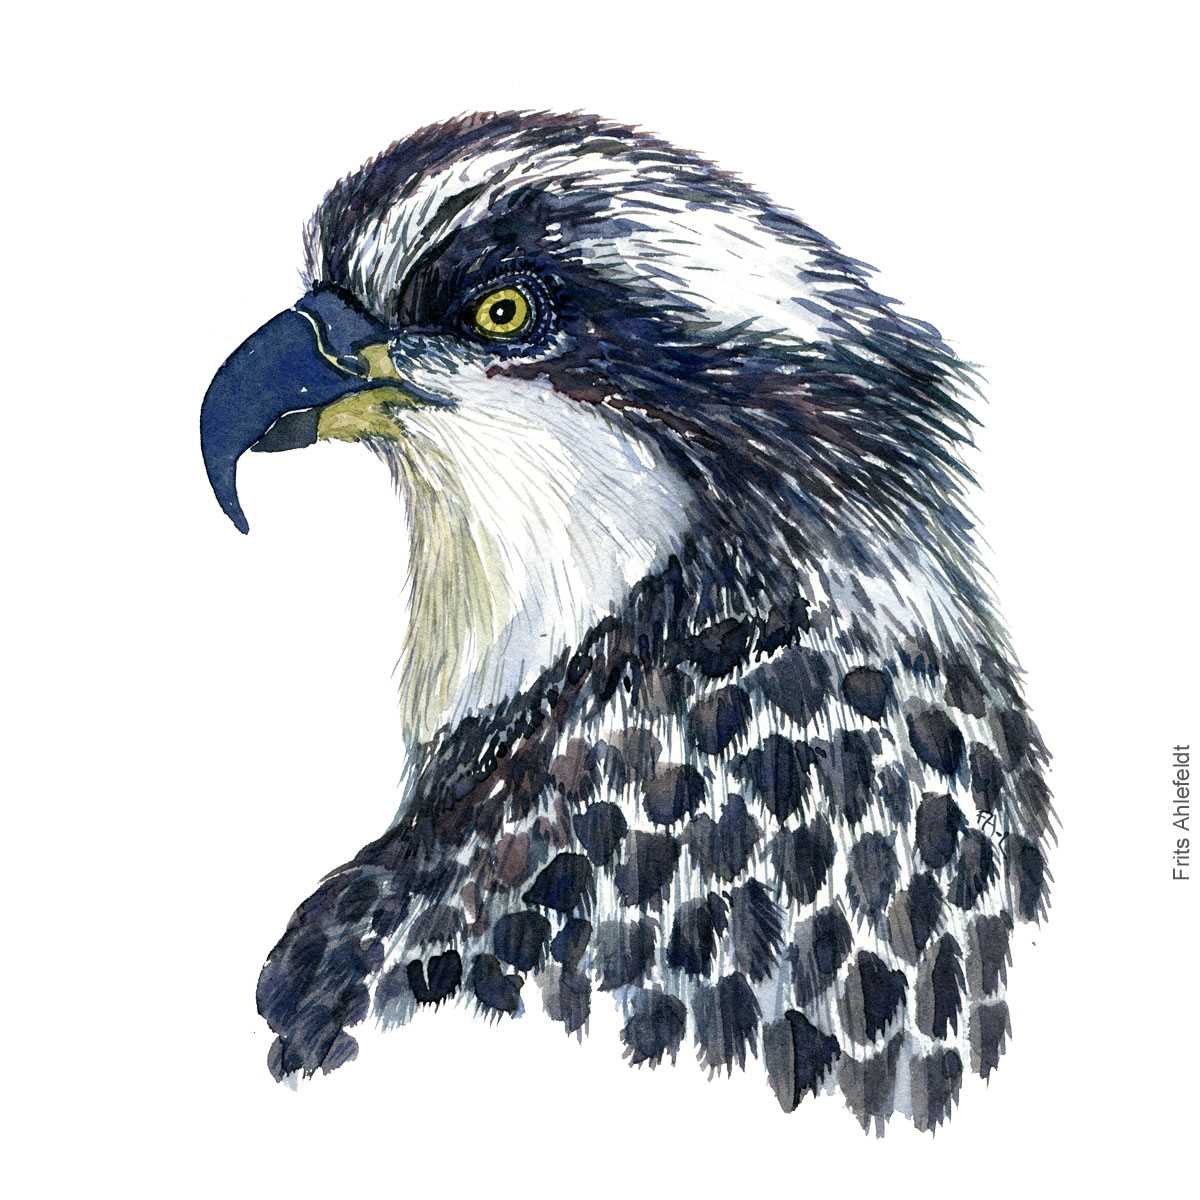 Fiskeoern - Osprey eagle head - Bird painting in watercolor by Frits Ahlefeldt - Fugle akvarel